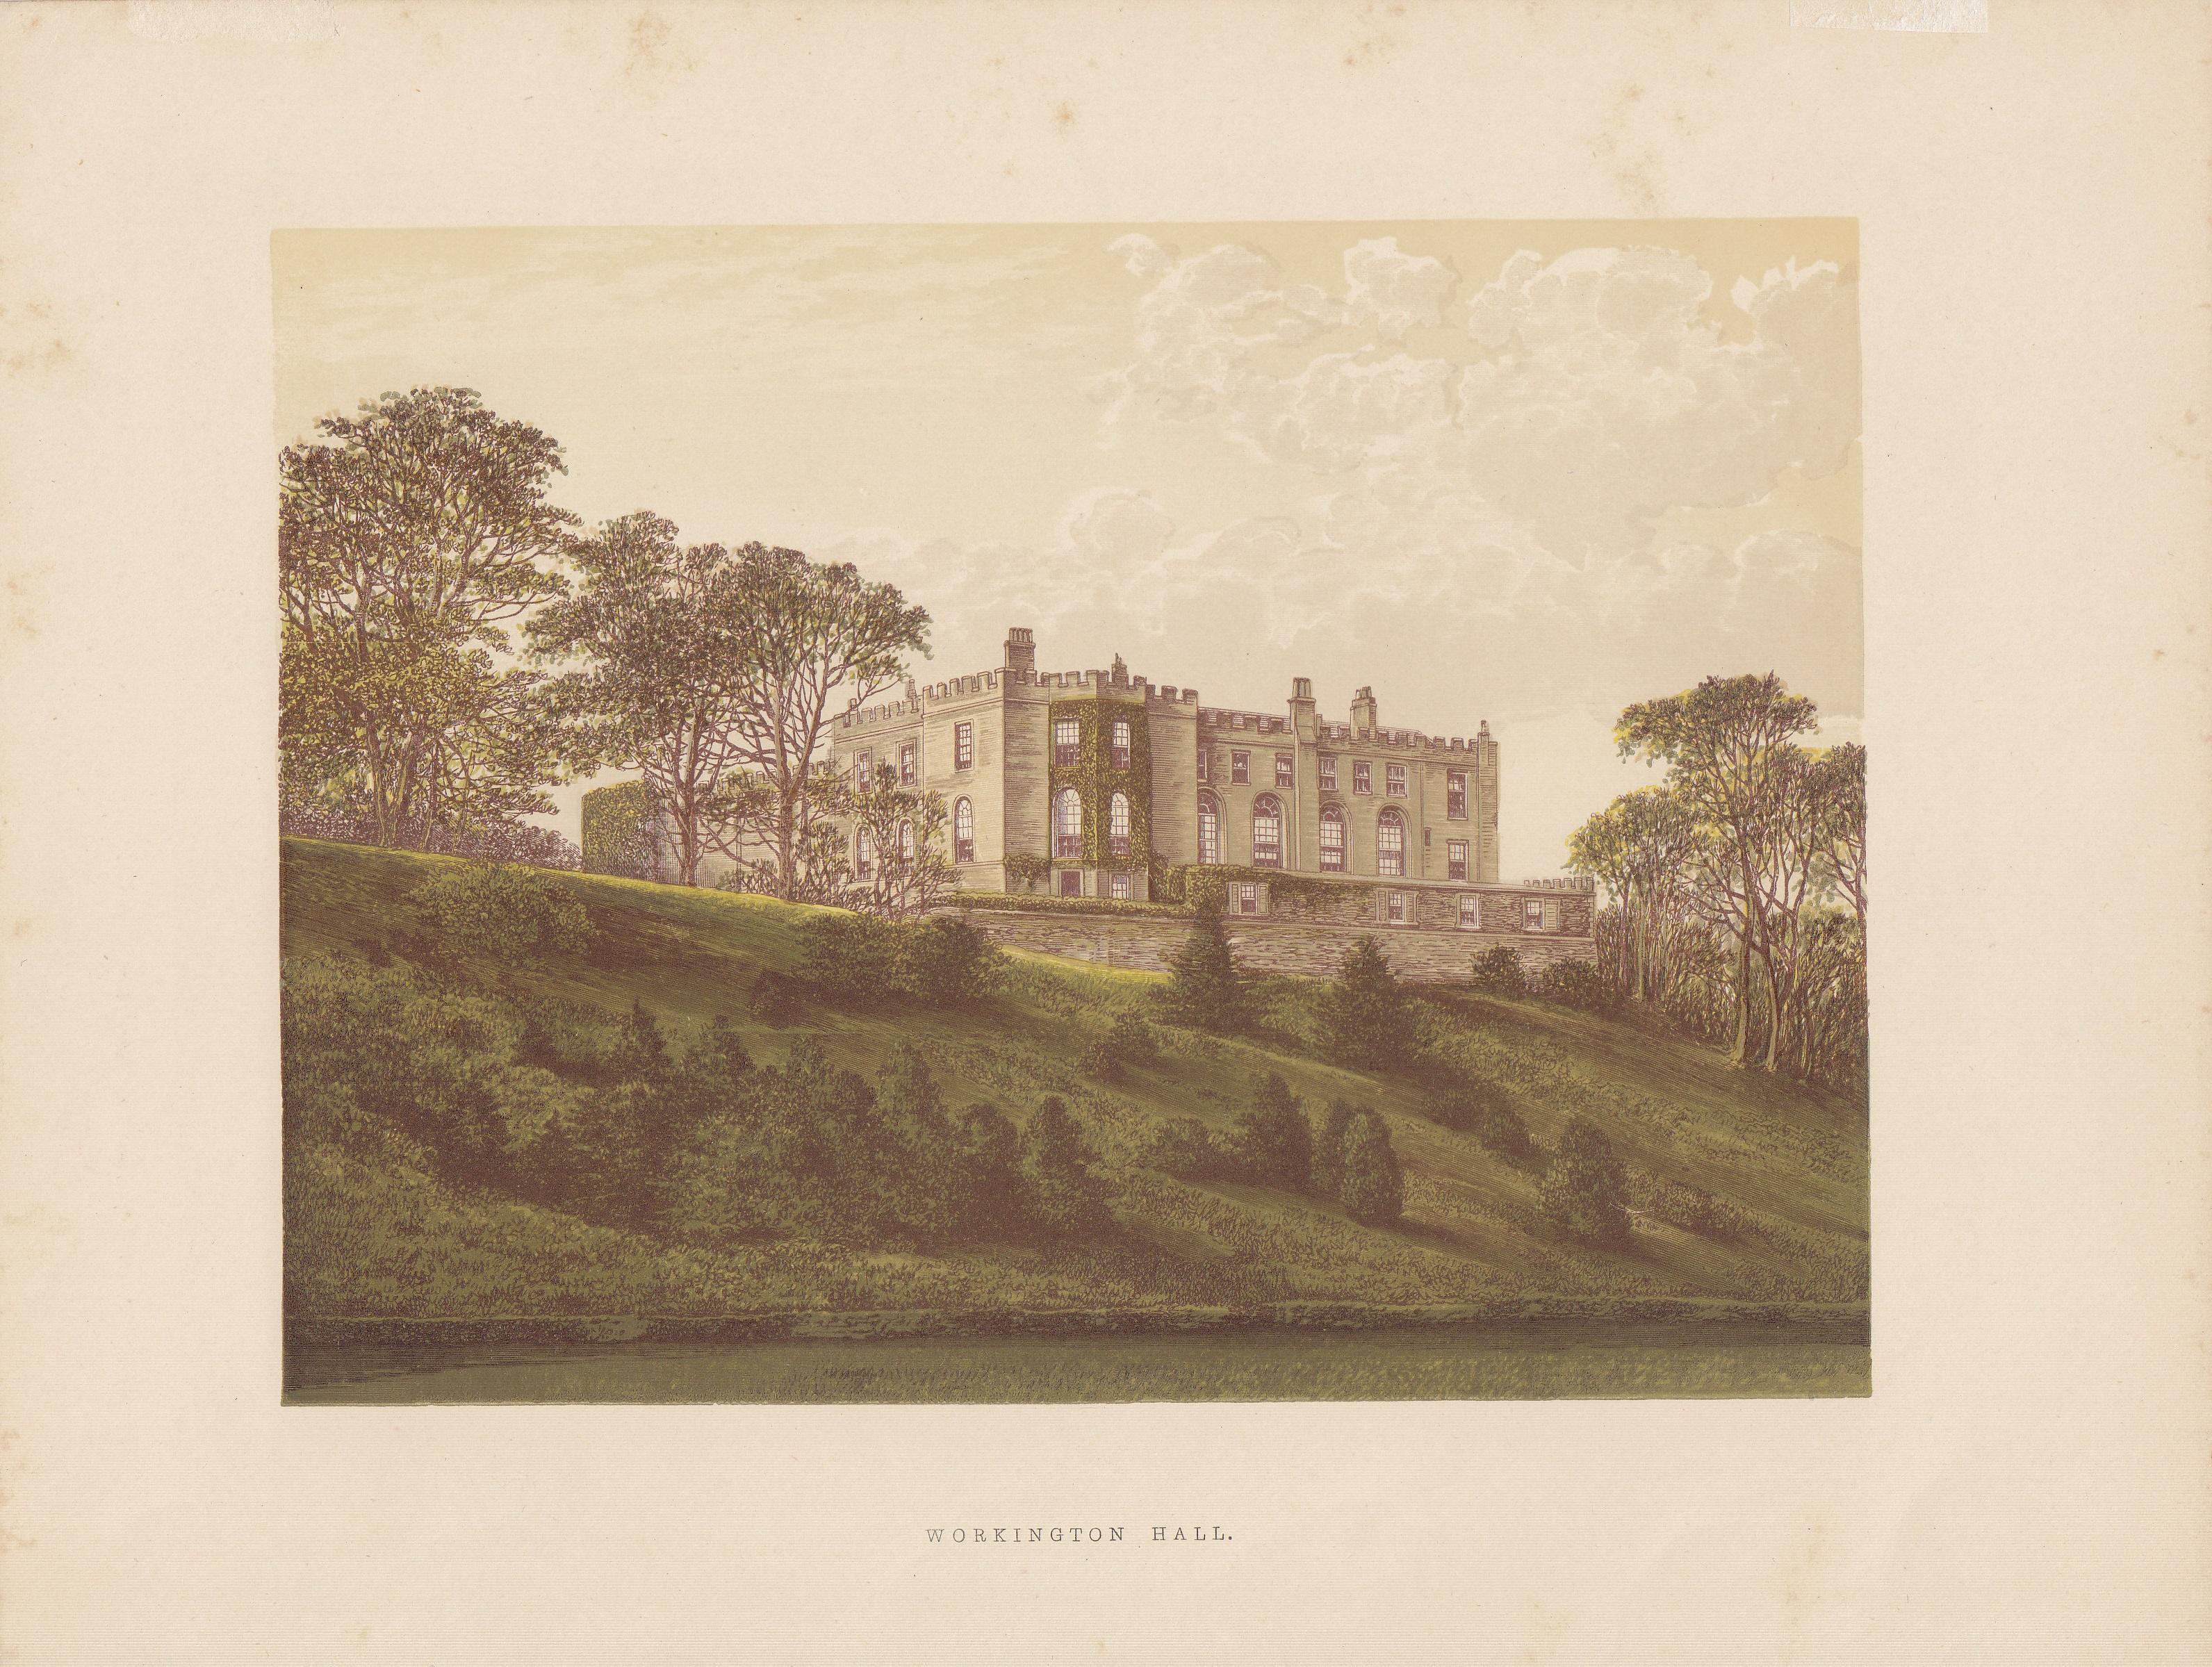 Workington Hall